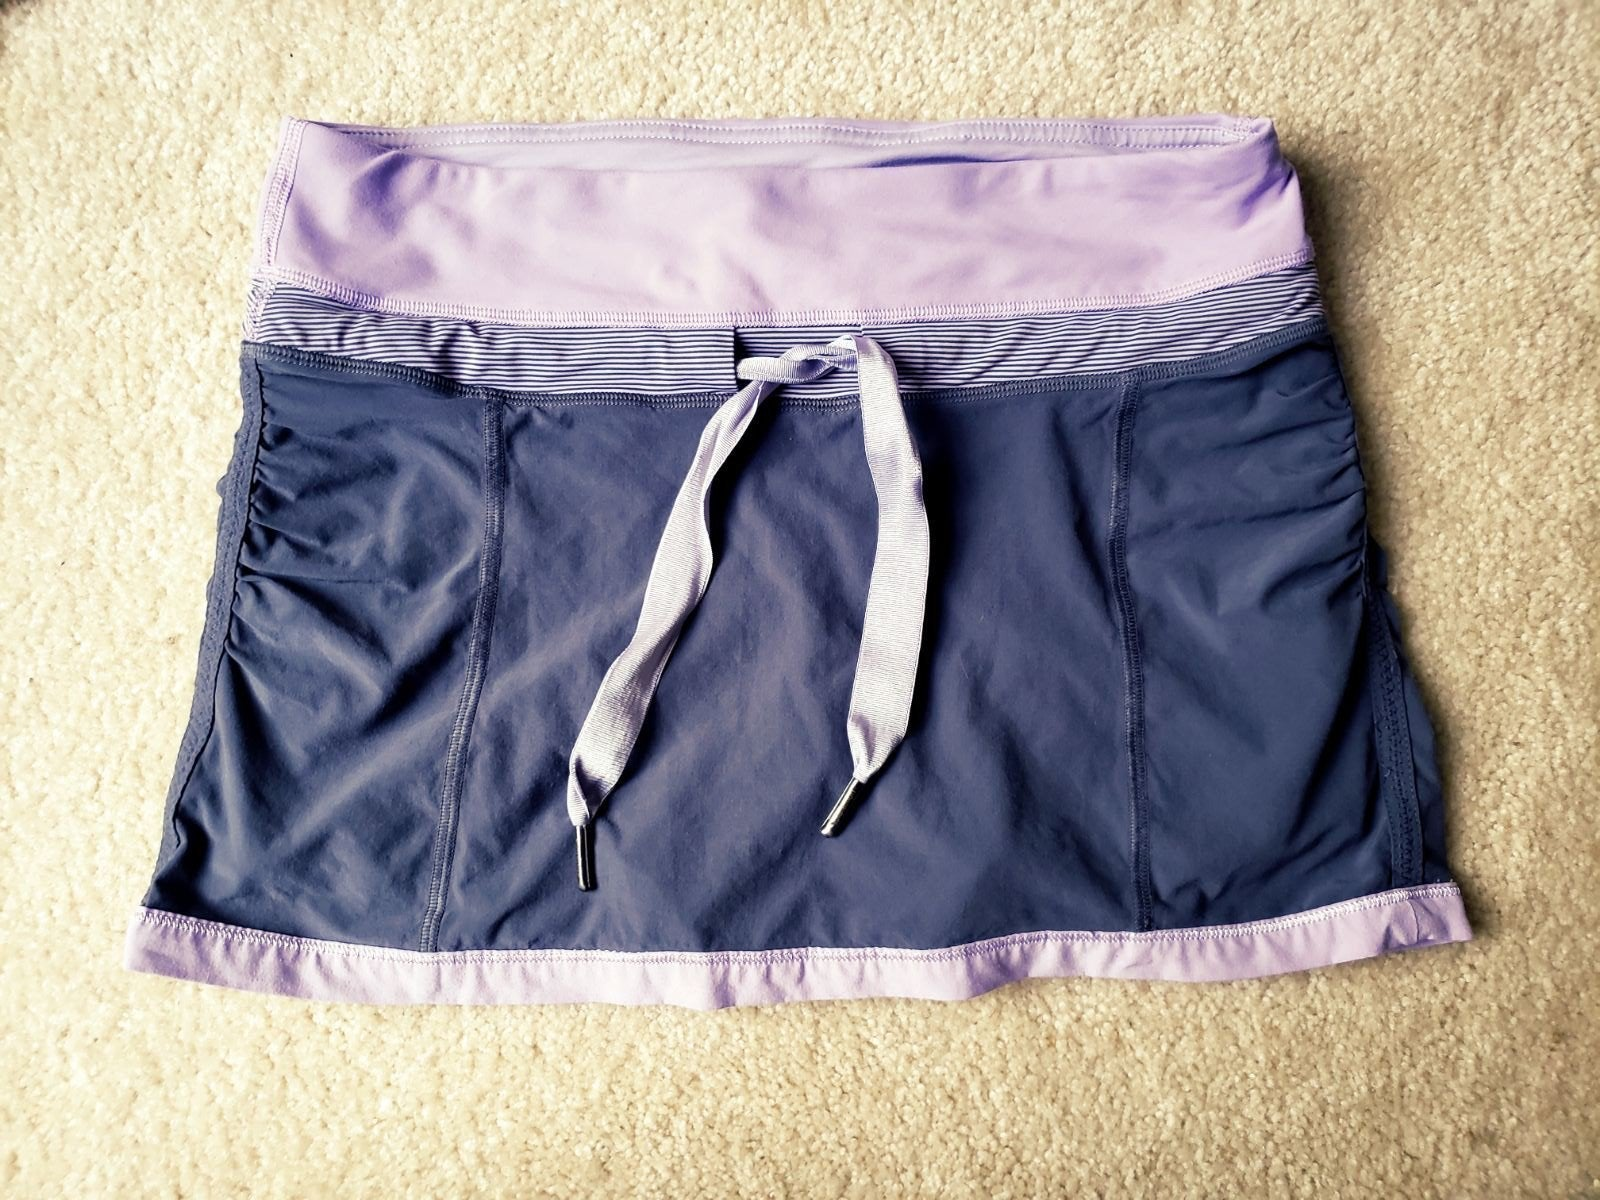 Lululemon Purple Grey Tennis Skirt Skort